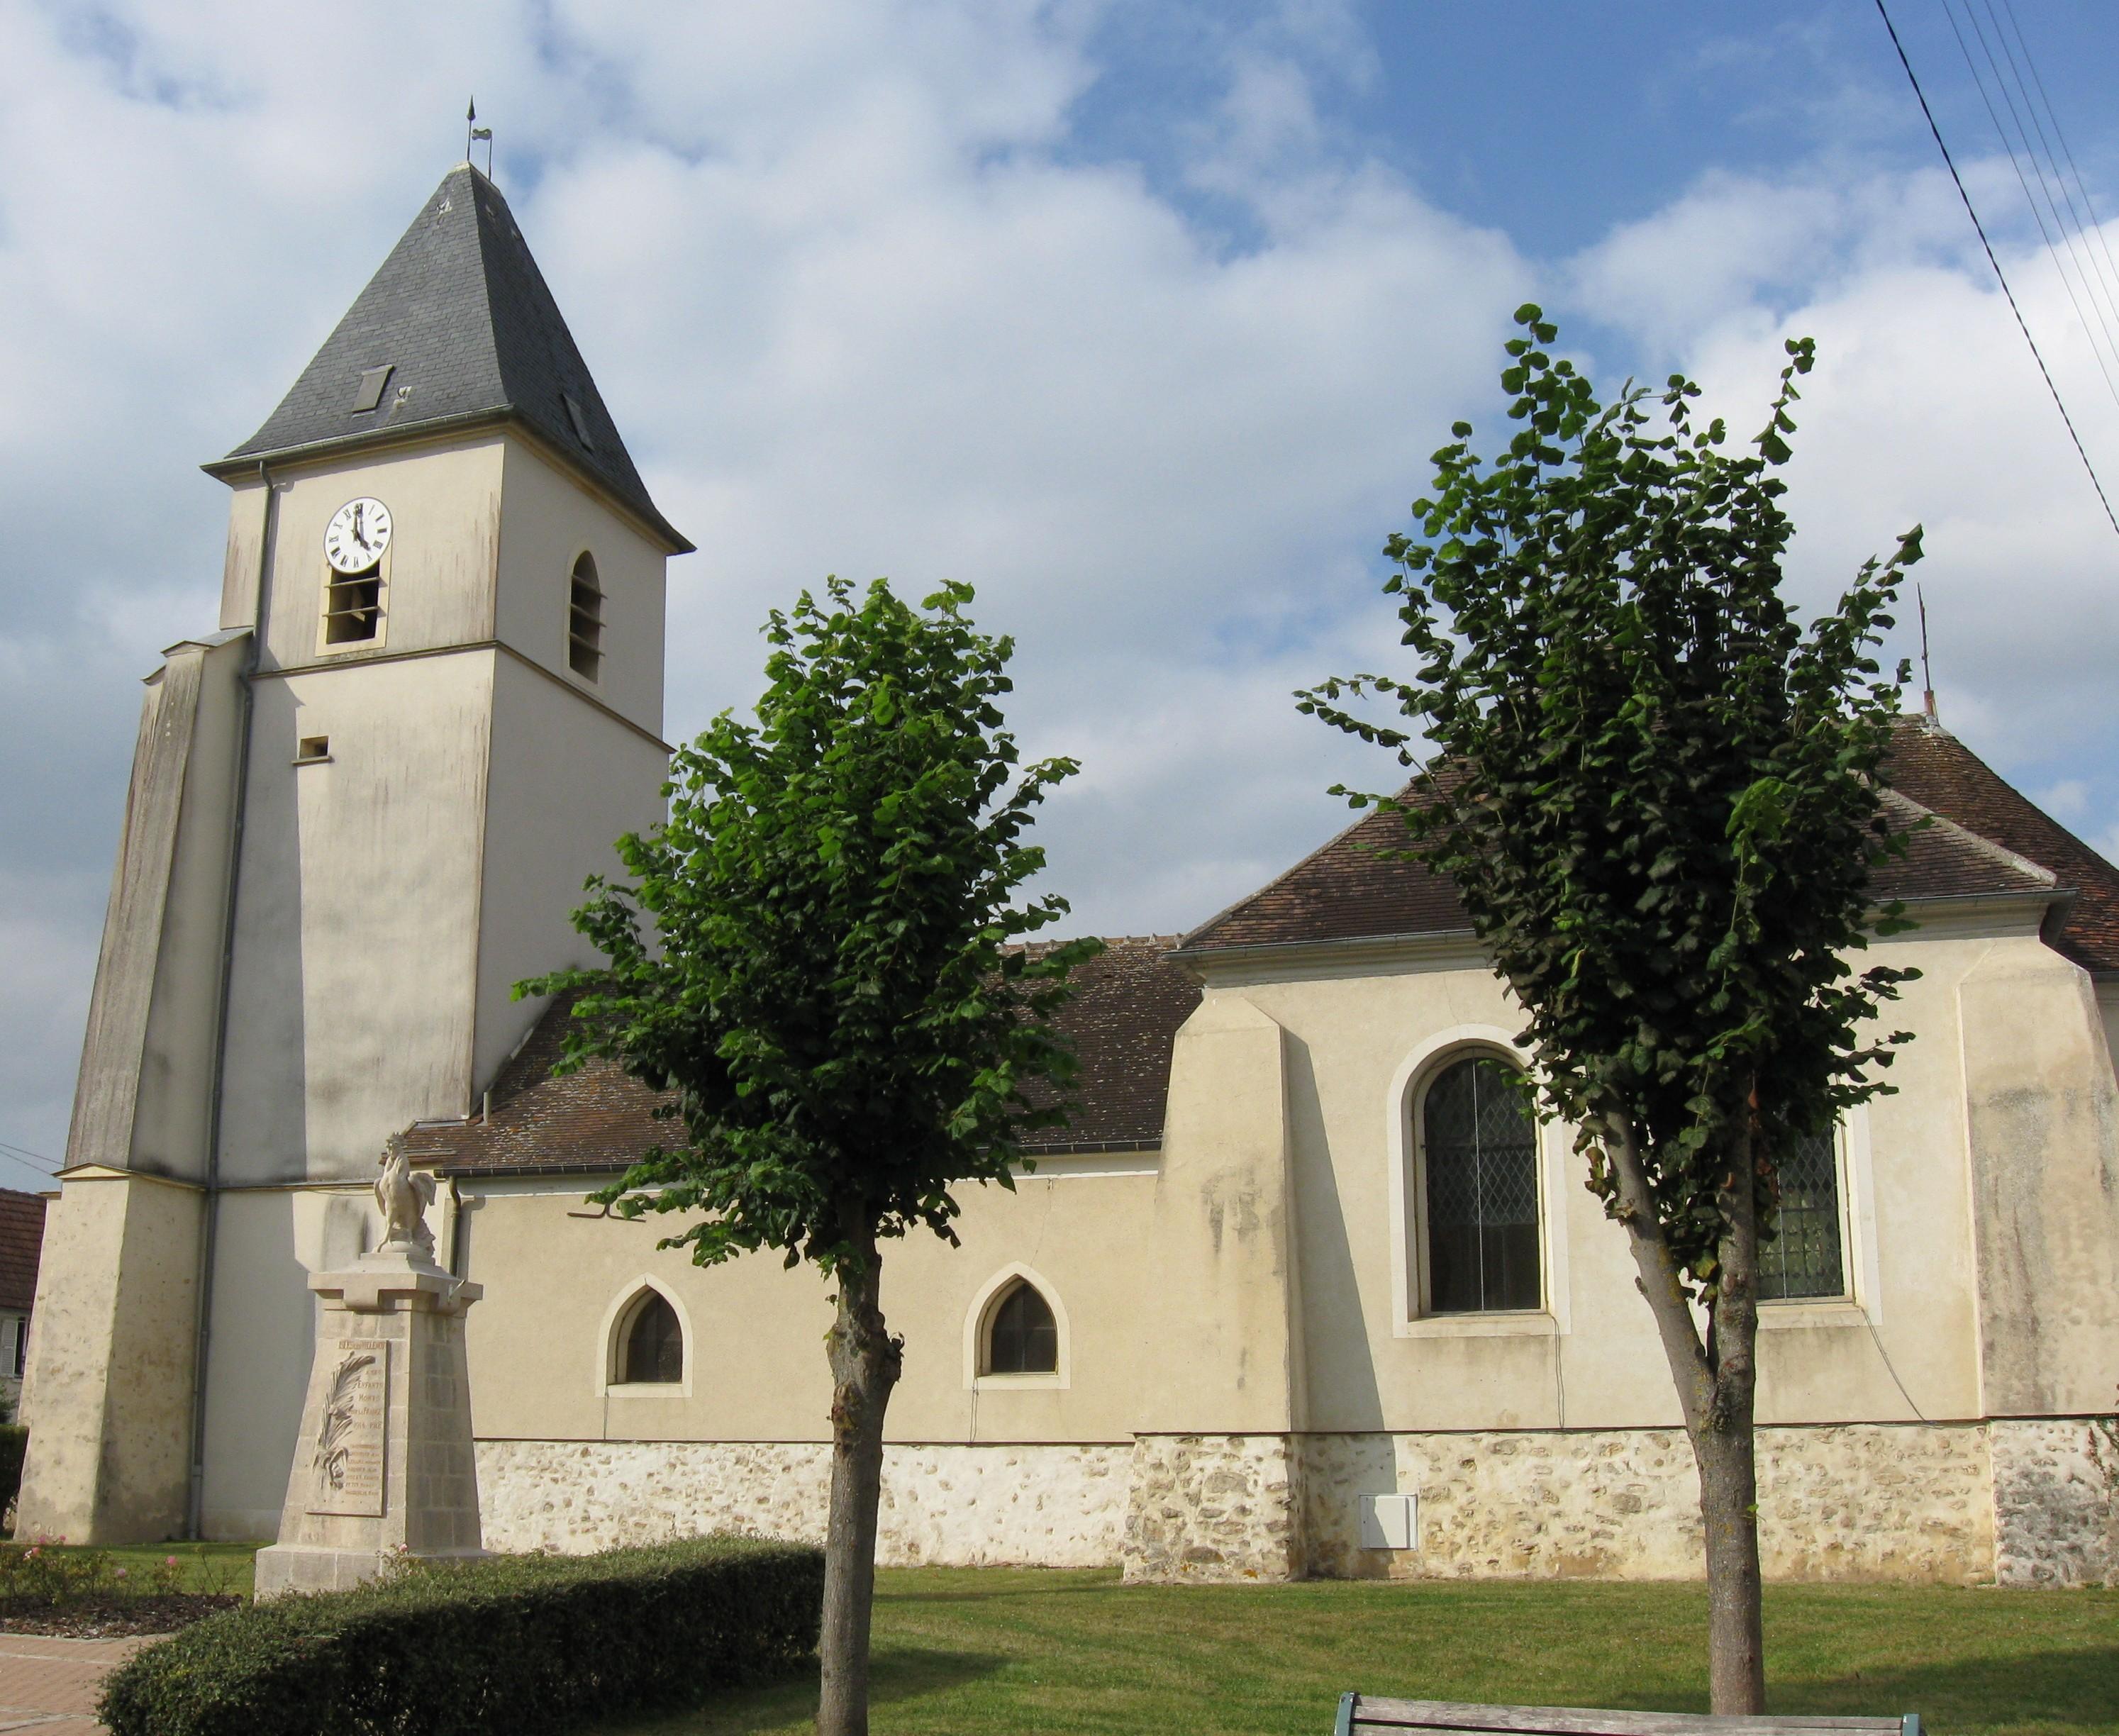 St Hildevert -Isles-lès-Villenoy